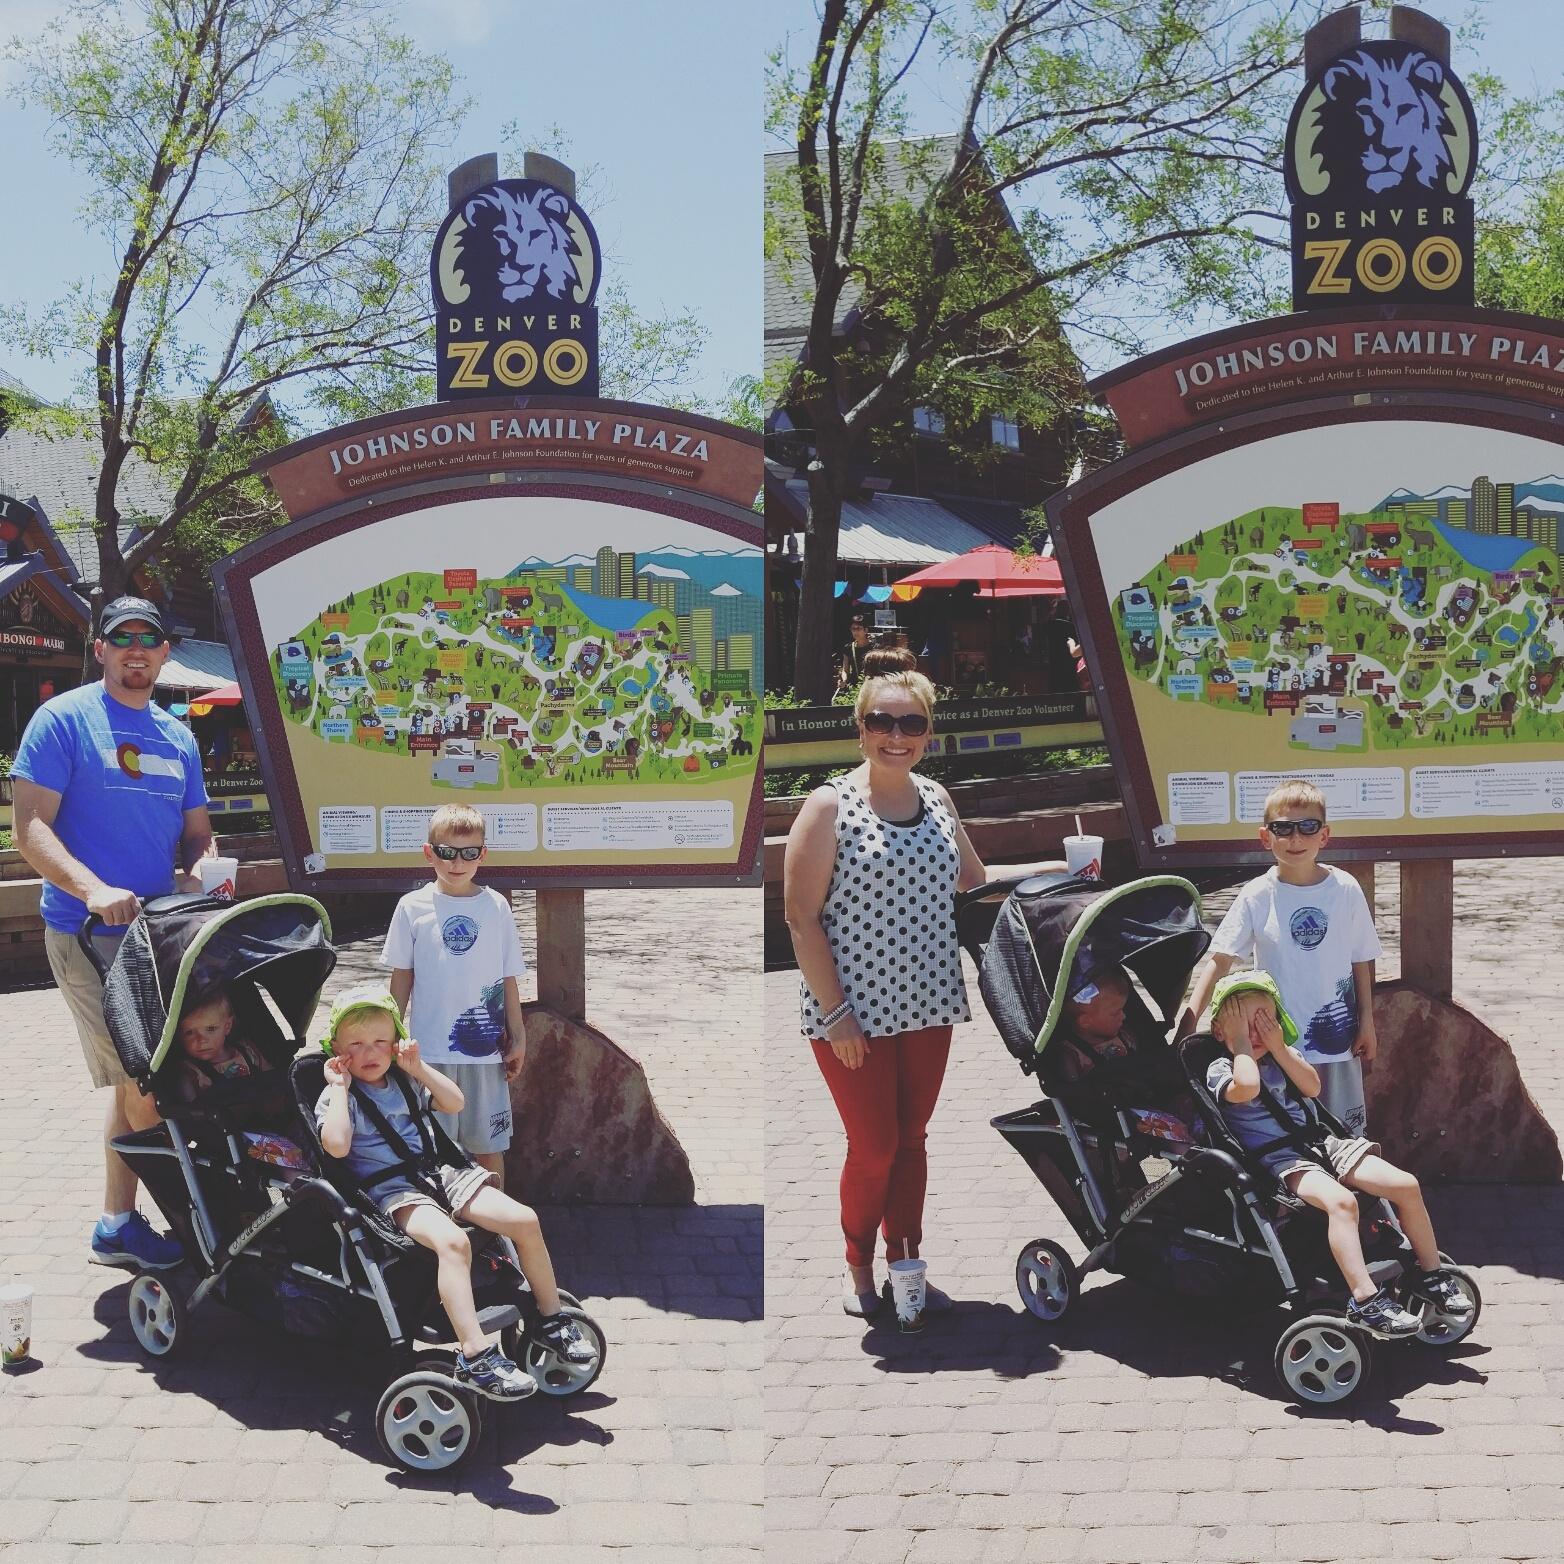 McCash Family blog: A Quick Trip